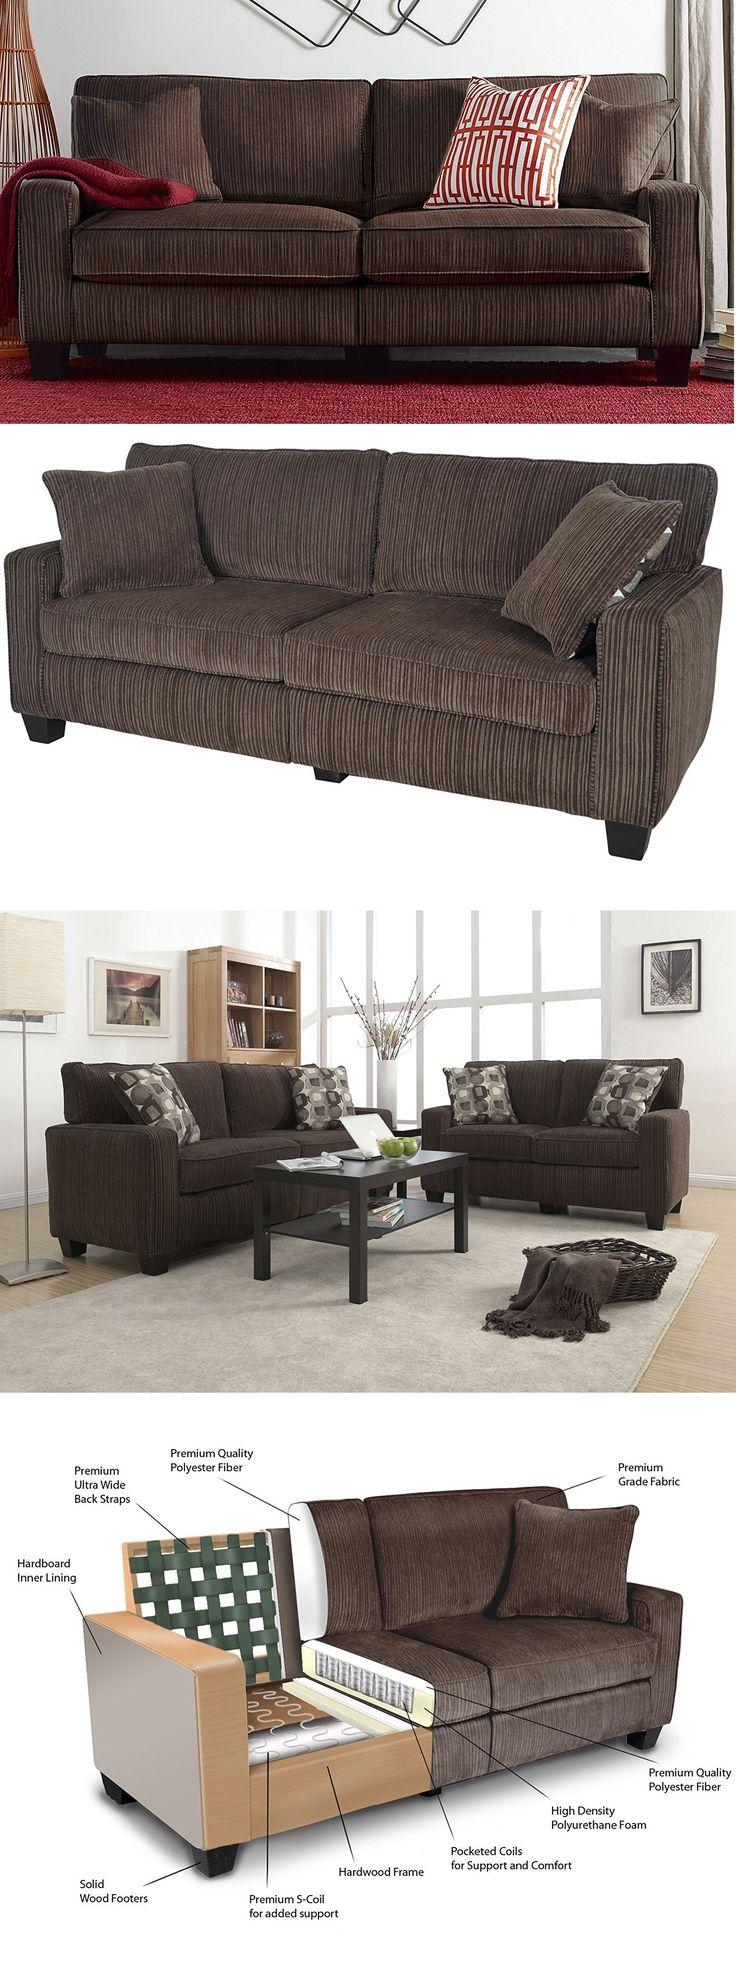 "Serta RTA Palisades Collection 78"" Sofa in Riverfront Brown #sofa #shopping  #Home #homedecor  #kitchendecor     #amazon #gift #house"